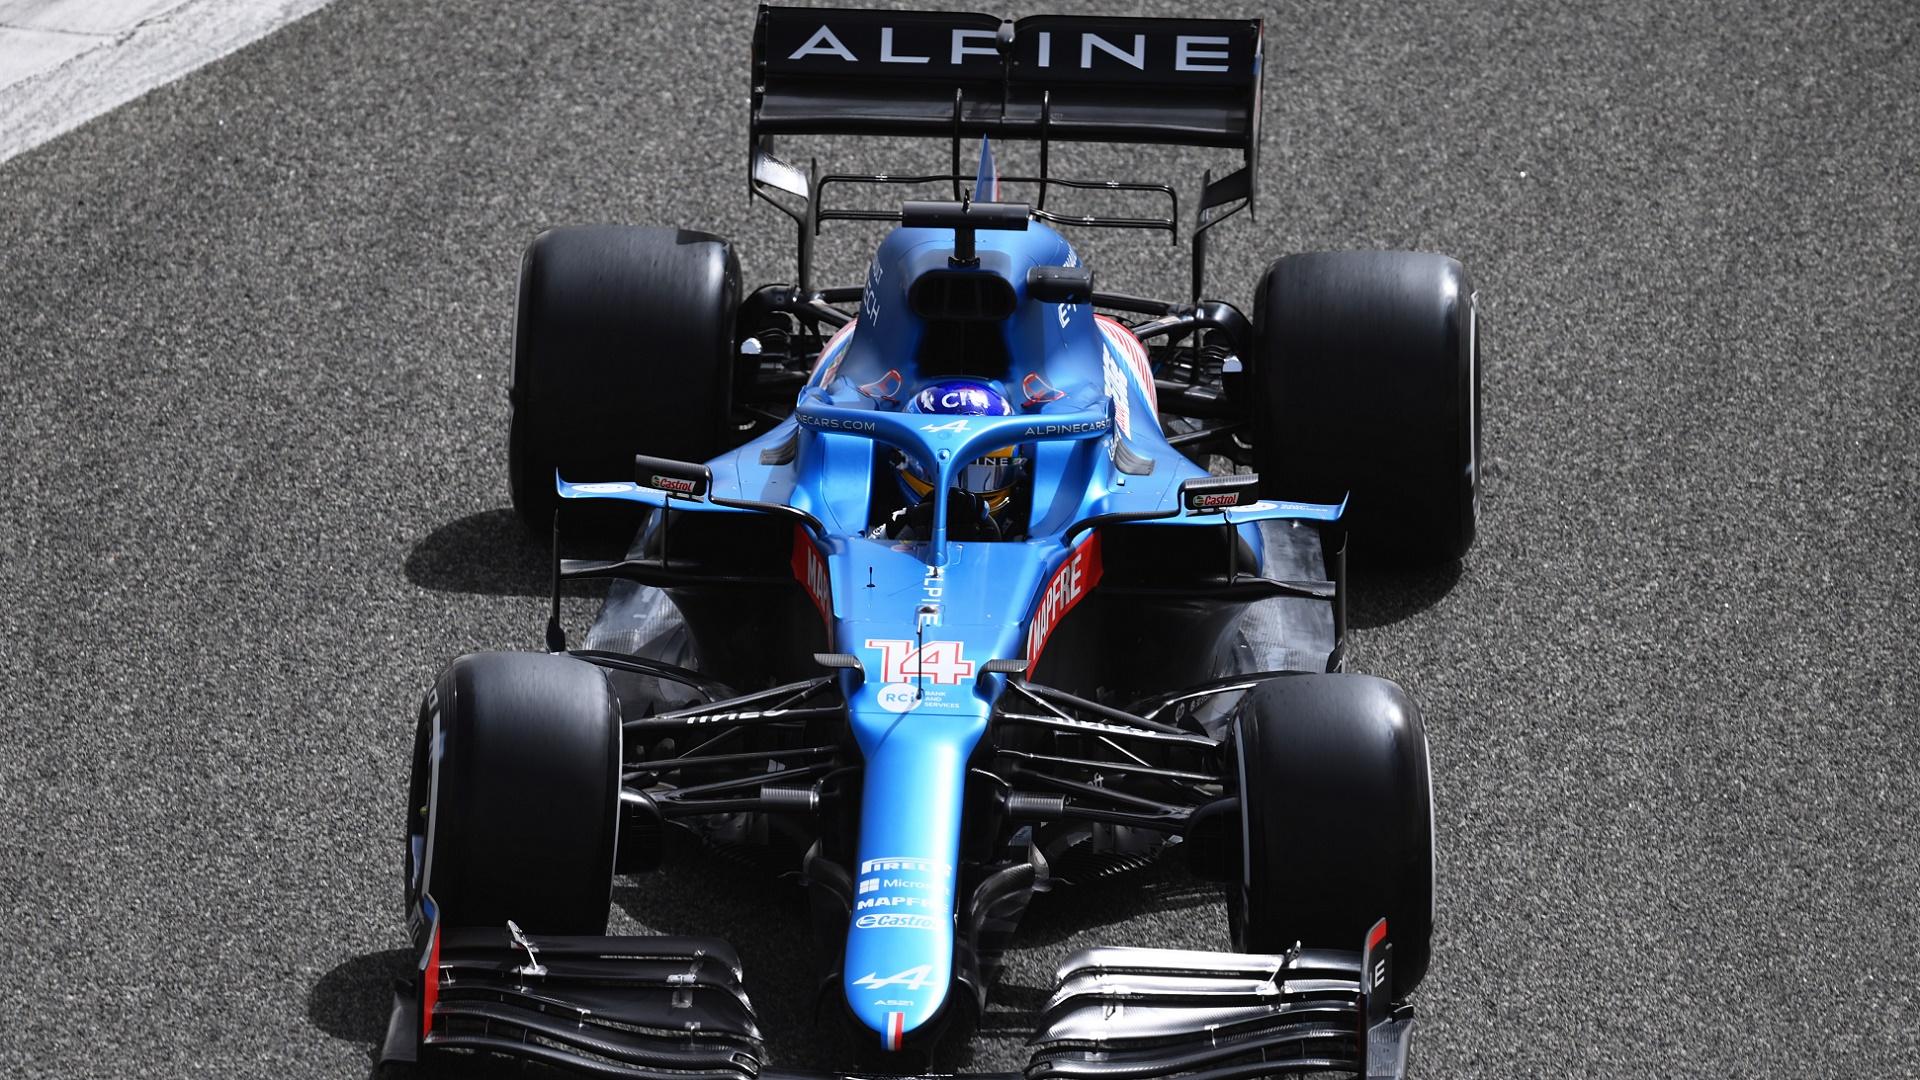 2021-03-13 Alonso Alpine F1 Formula 1